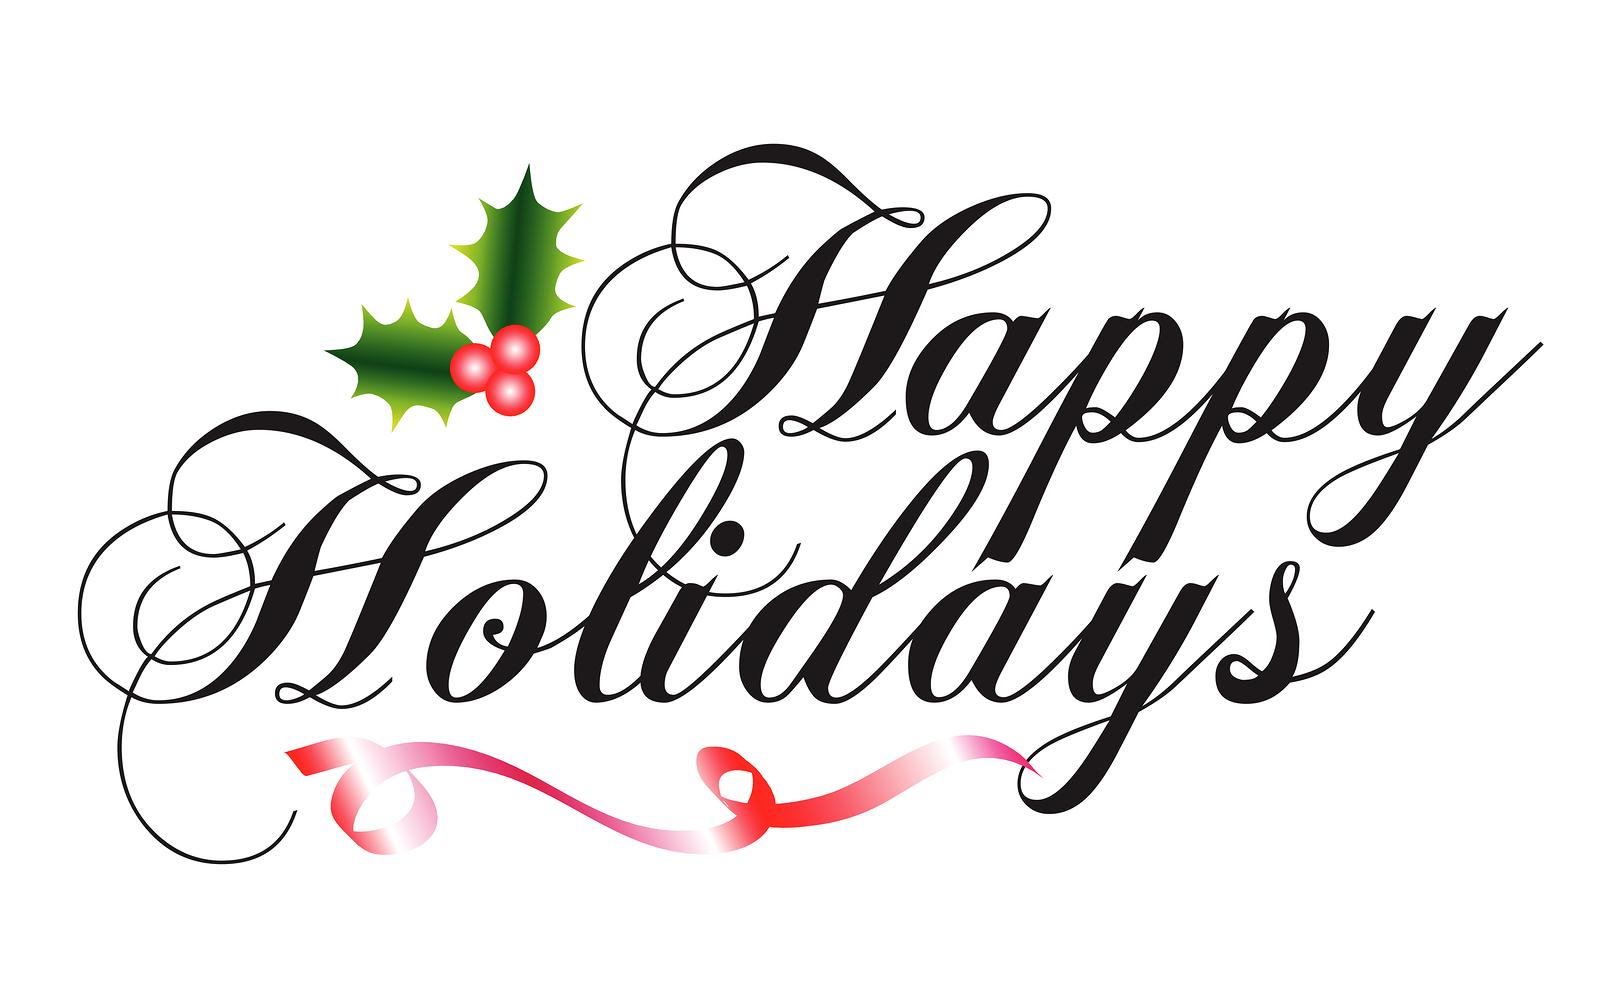 at-noon-through-january-1st-bigstock-happy-holidays-type-6316938-6KIRBu-clipart.jpg